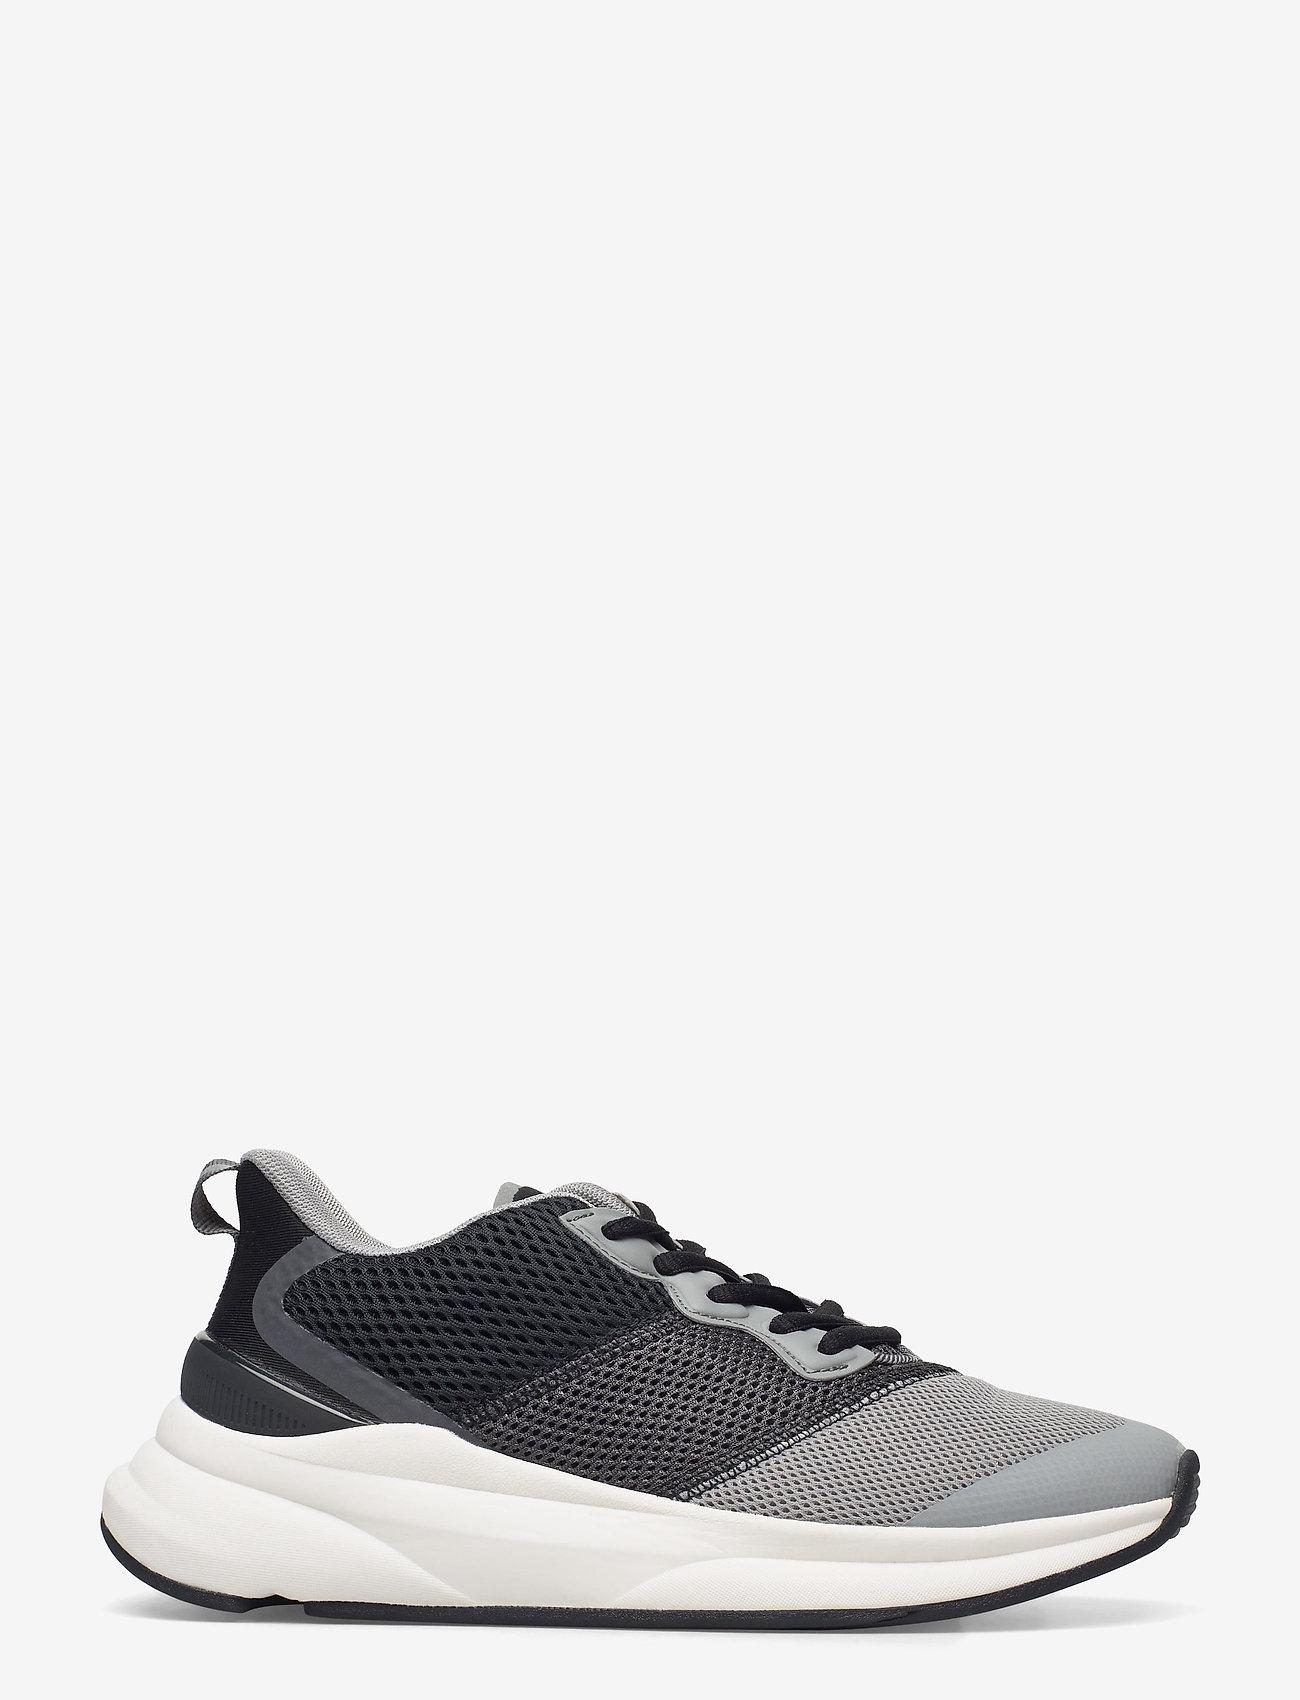 Hummel - REACH LX 600 - laag sneakers - black - 1